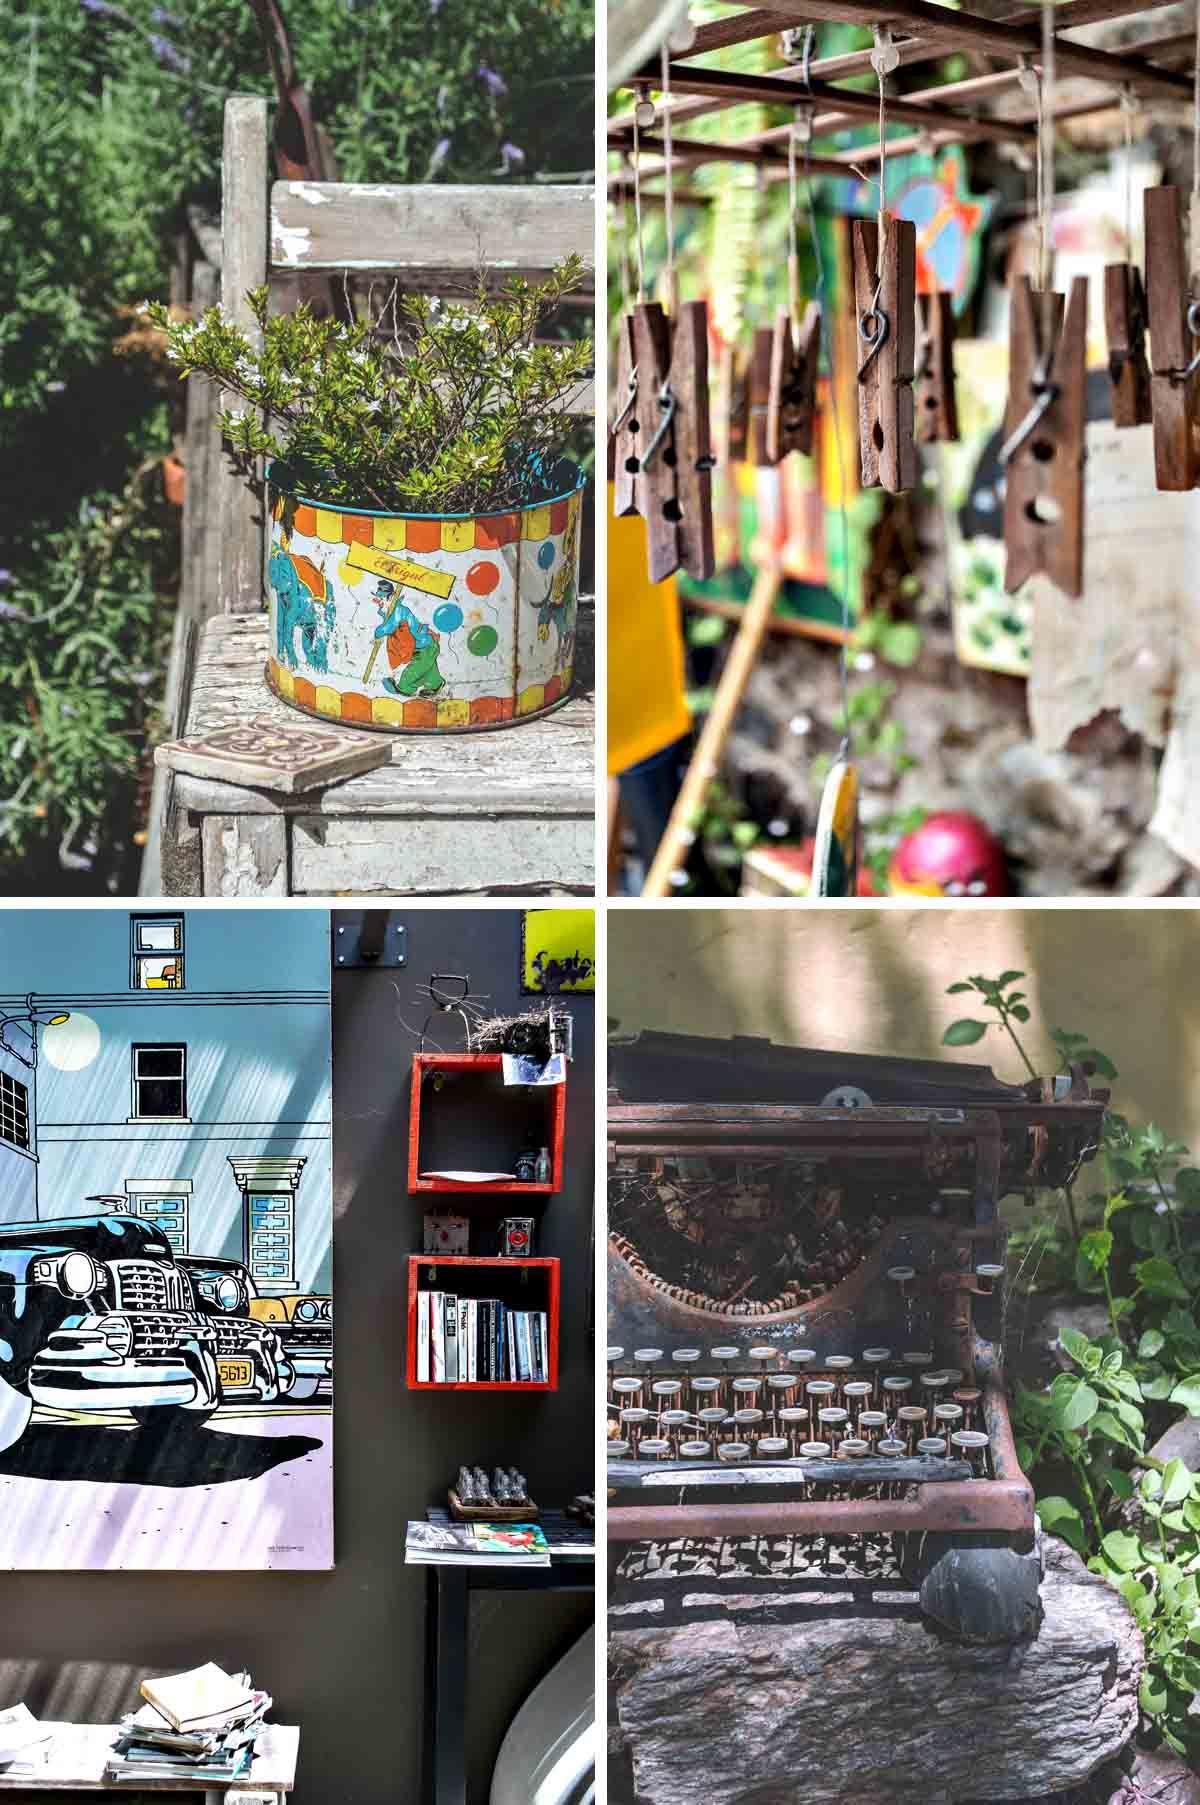 Quirky touches everywhere you look at La Posadita de la Plaza, Colonia del Sacramento - Uruguay | heneedsfood.com